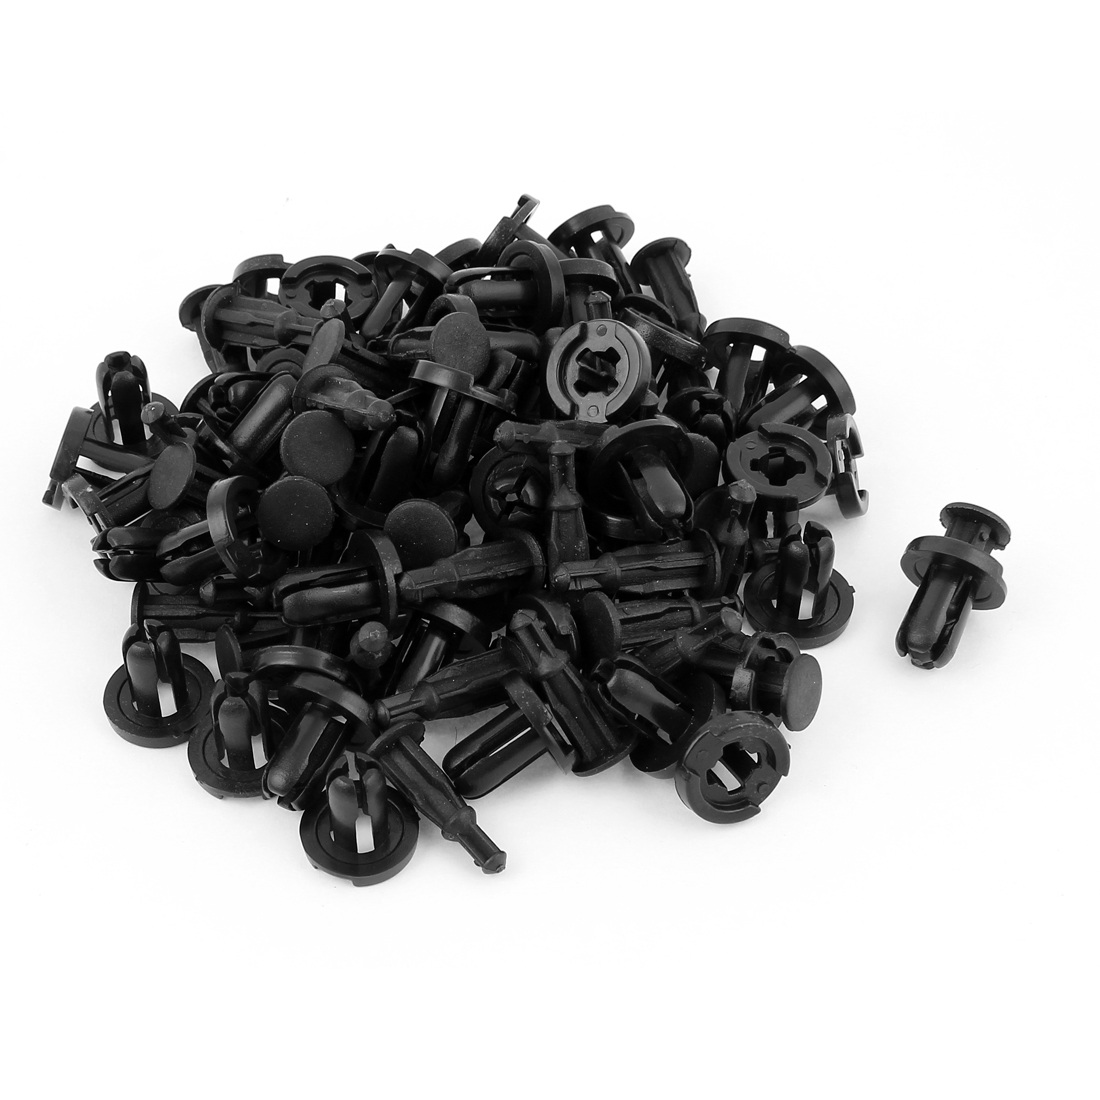 50pcs 20 x 9.5mm Car Auto Fairing Trim Plastic Push Fit Rivet Clips